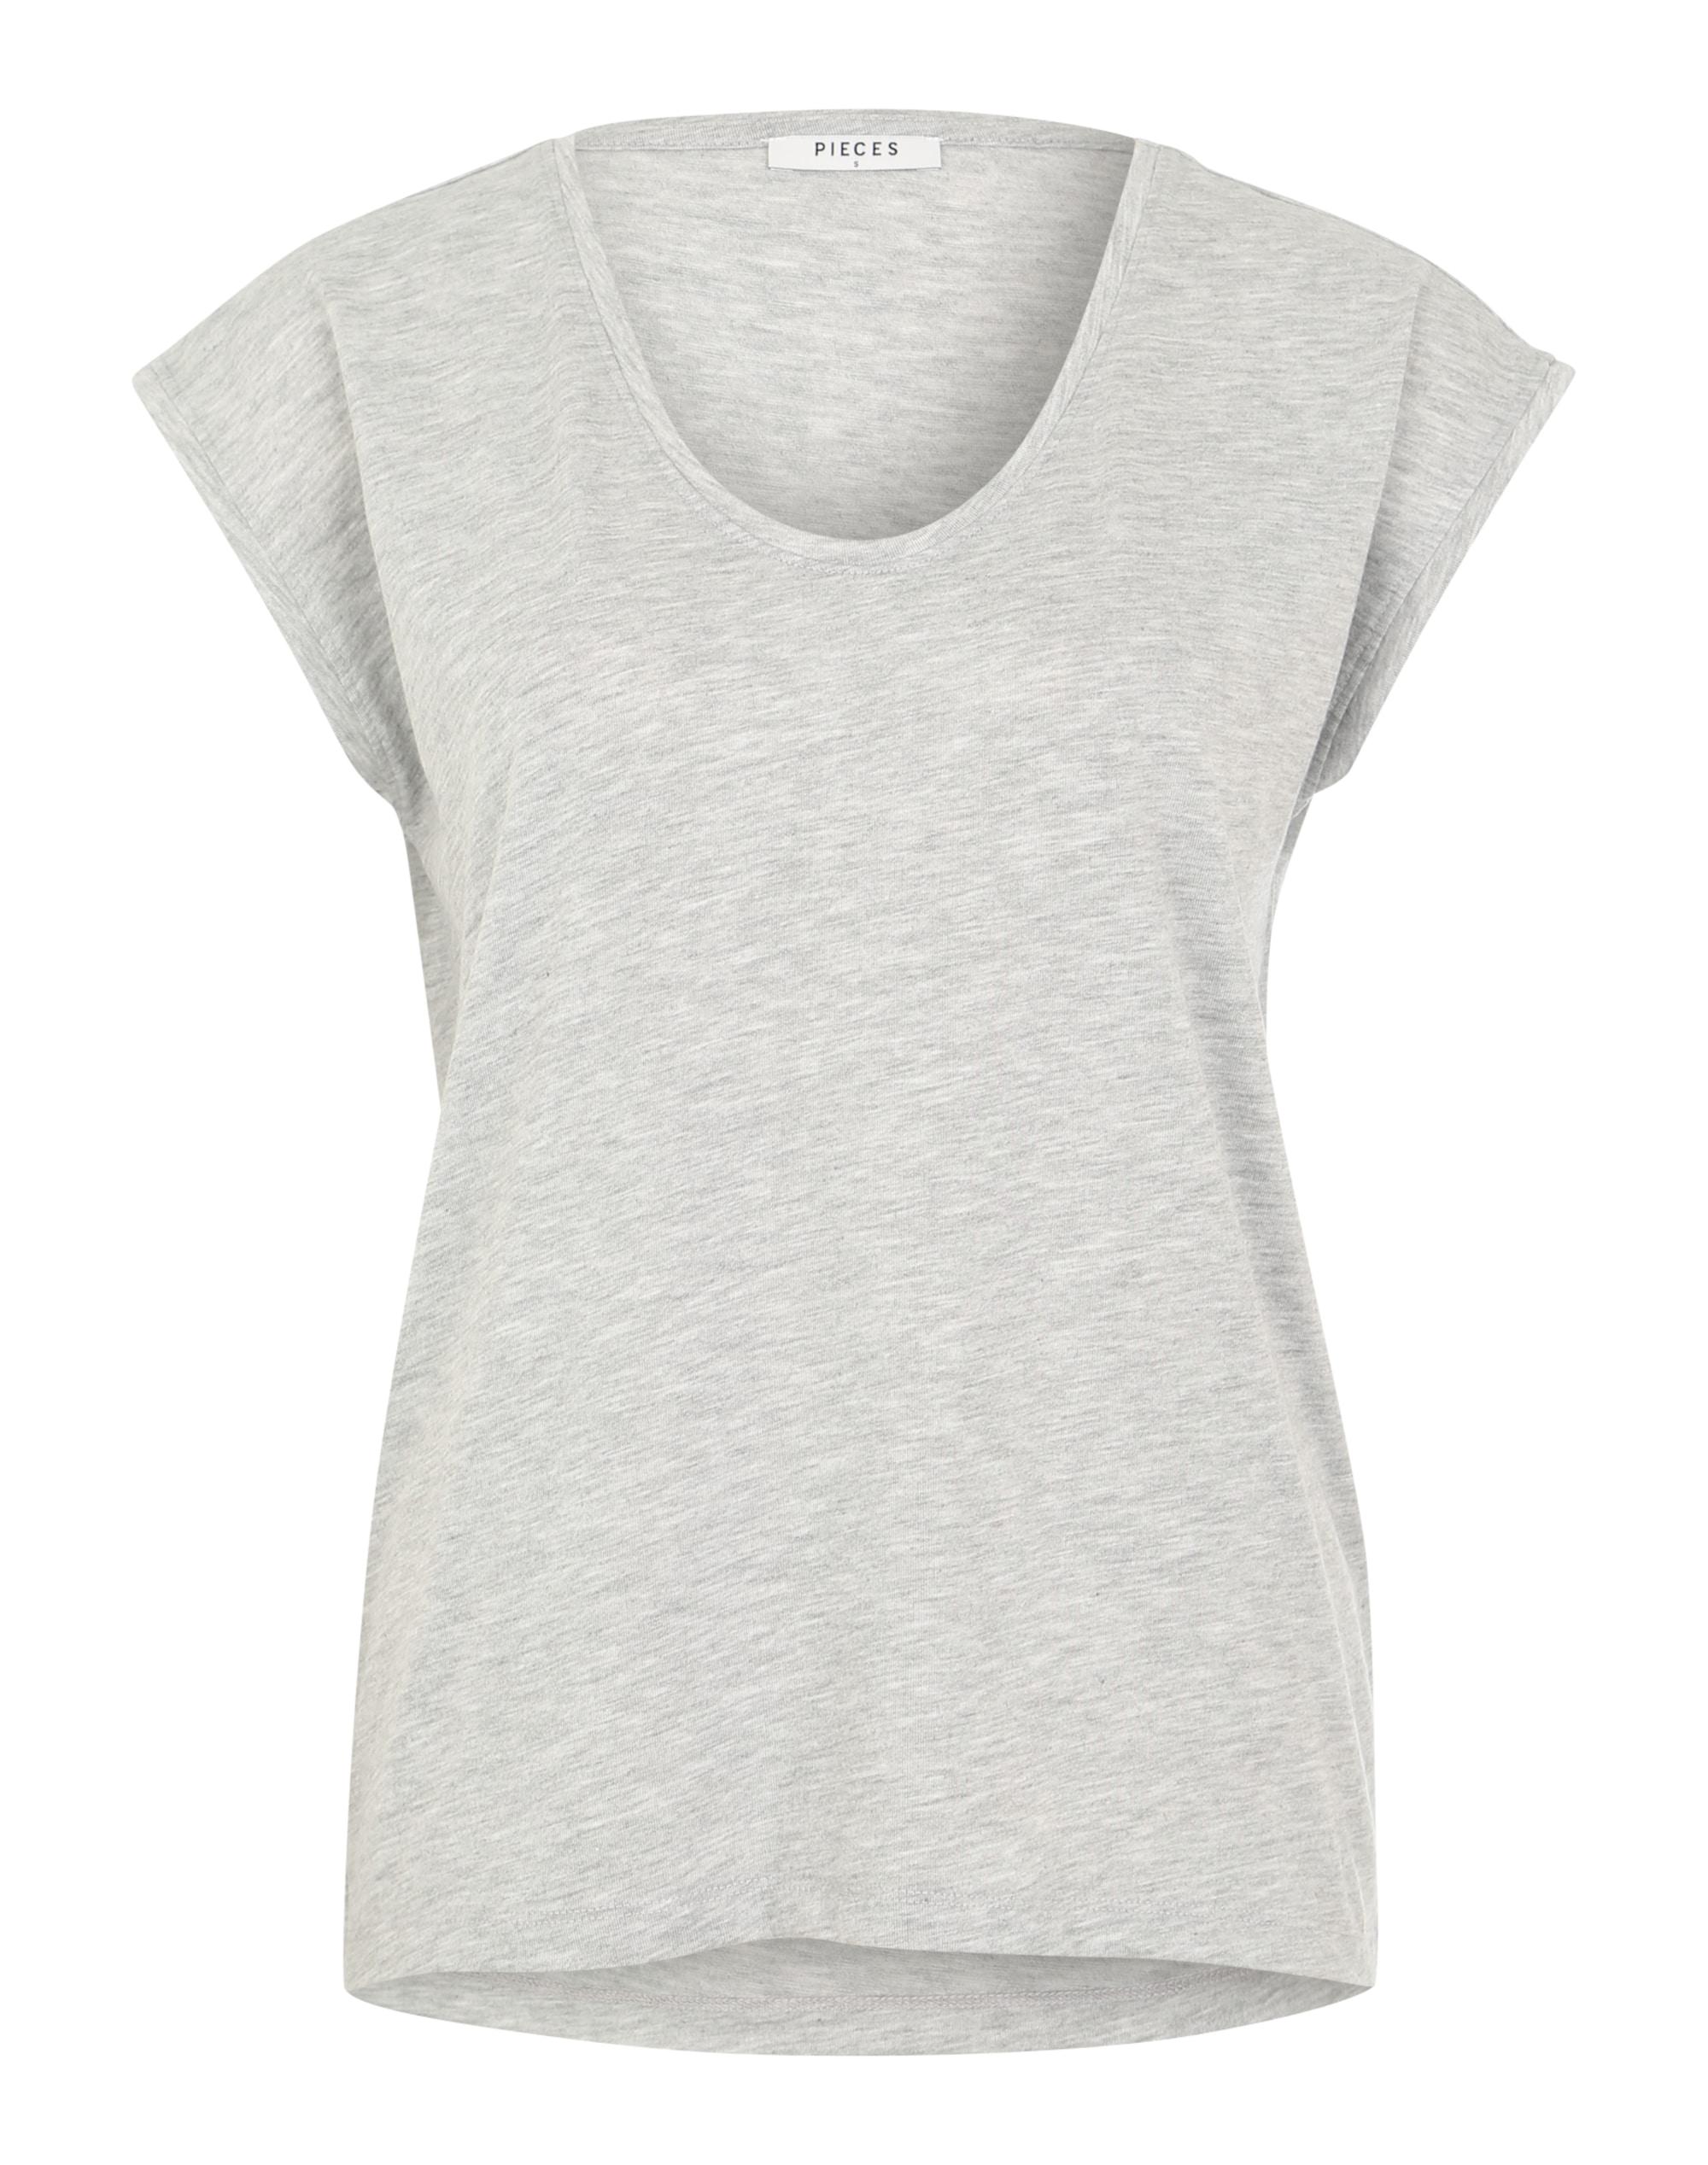 Image of Ärmelloses T-Shirt ´Billo´